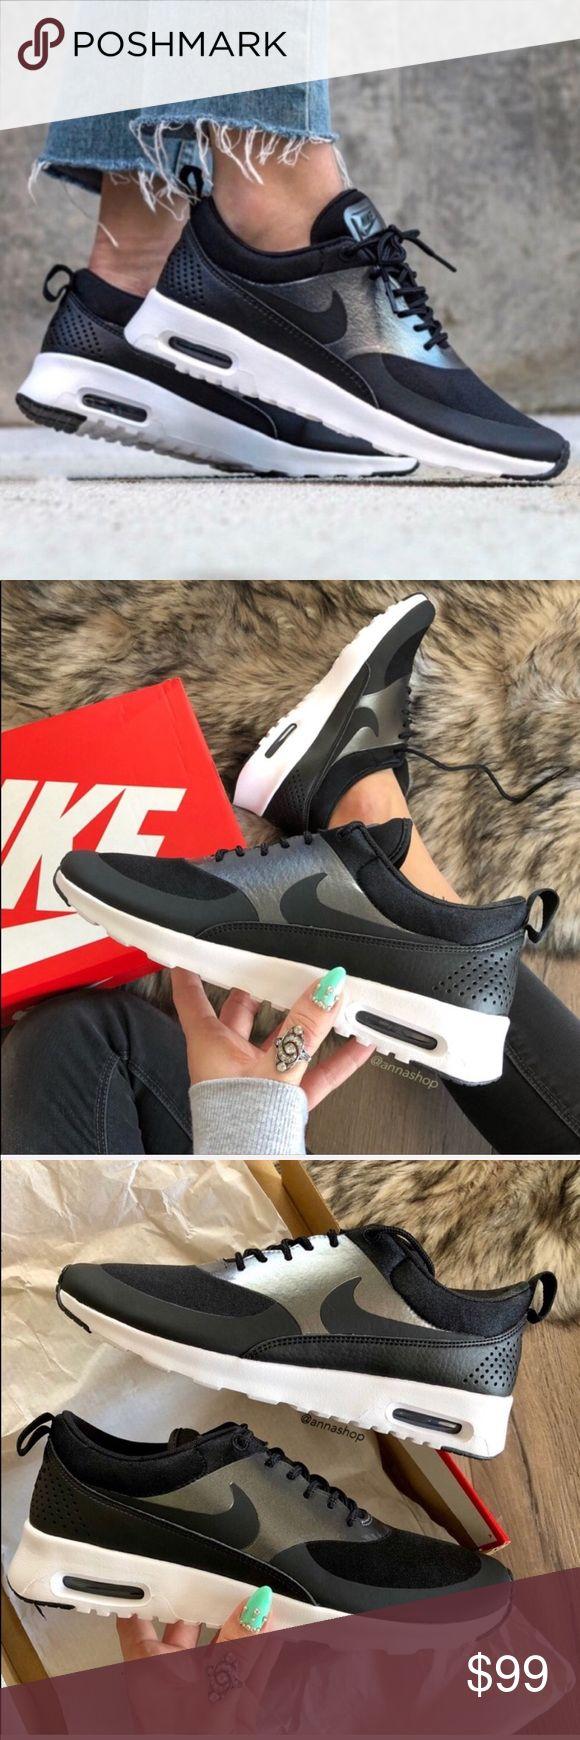 NWT Nike Air Max Thea Black Rare NWT (With images) | Nike